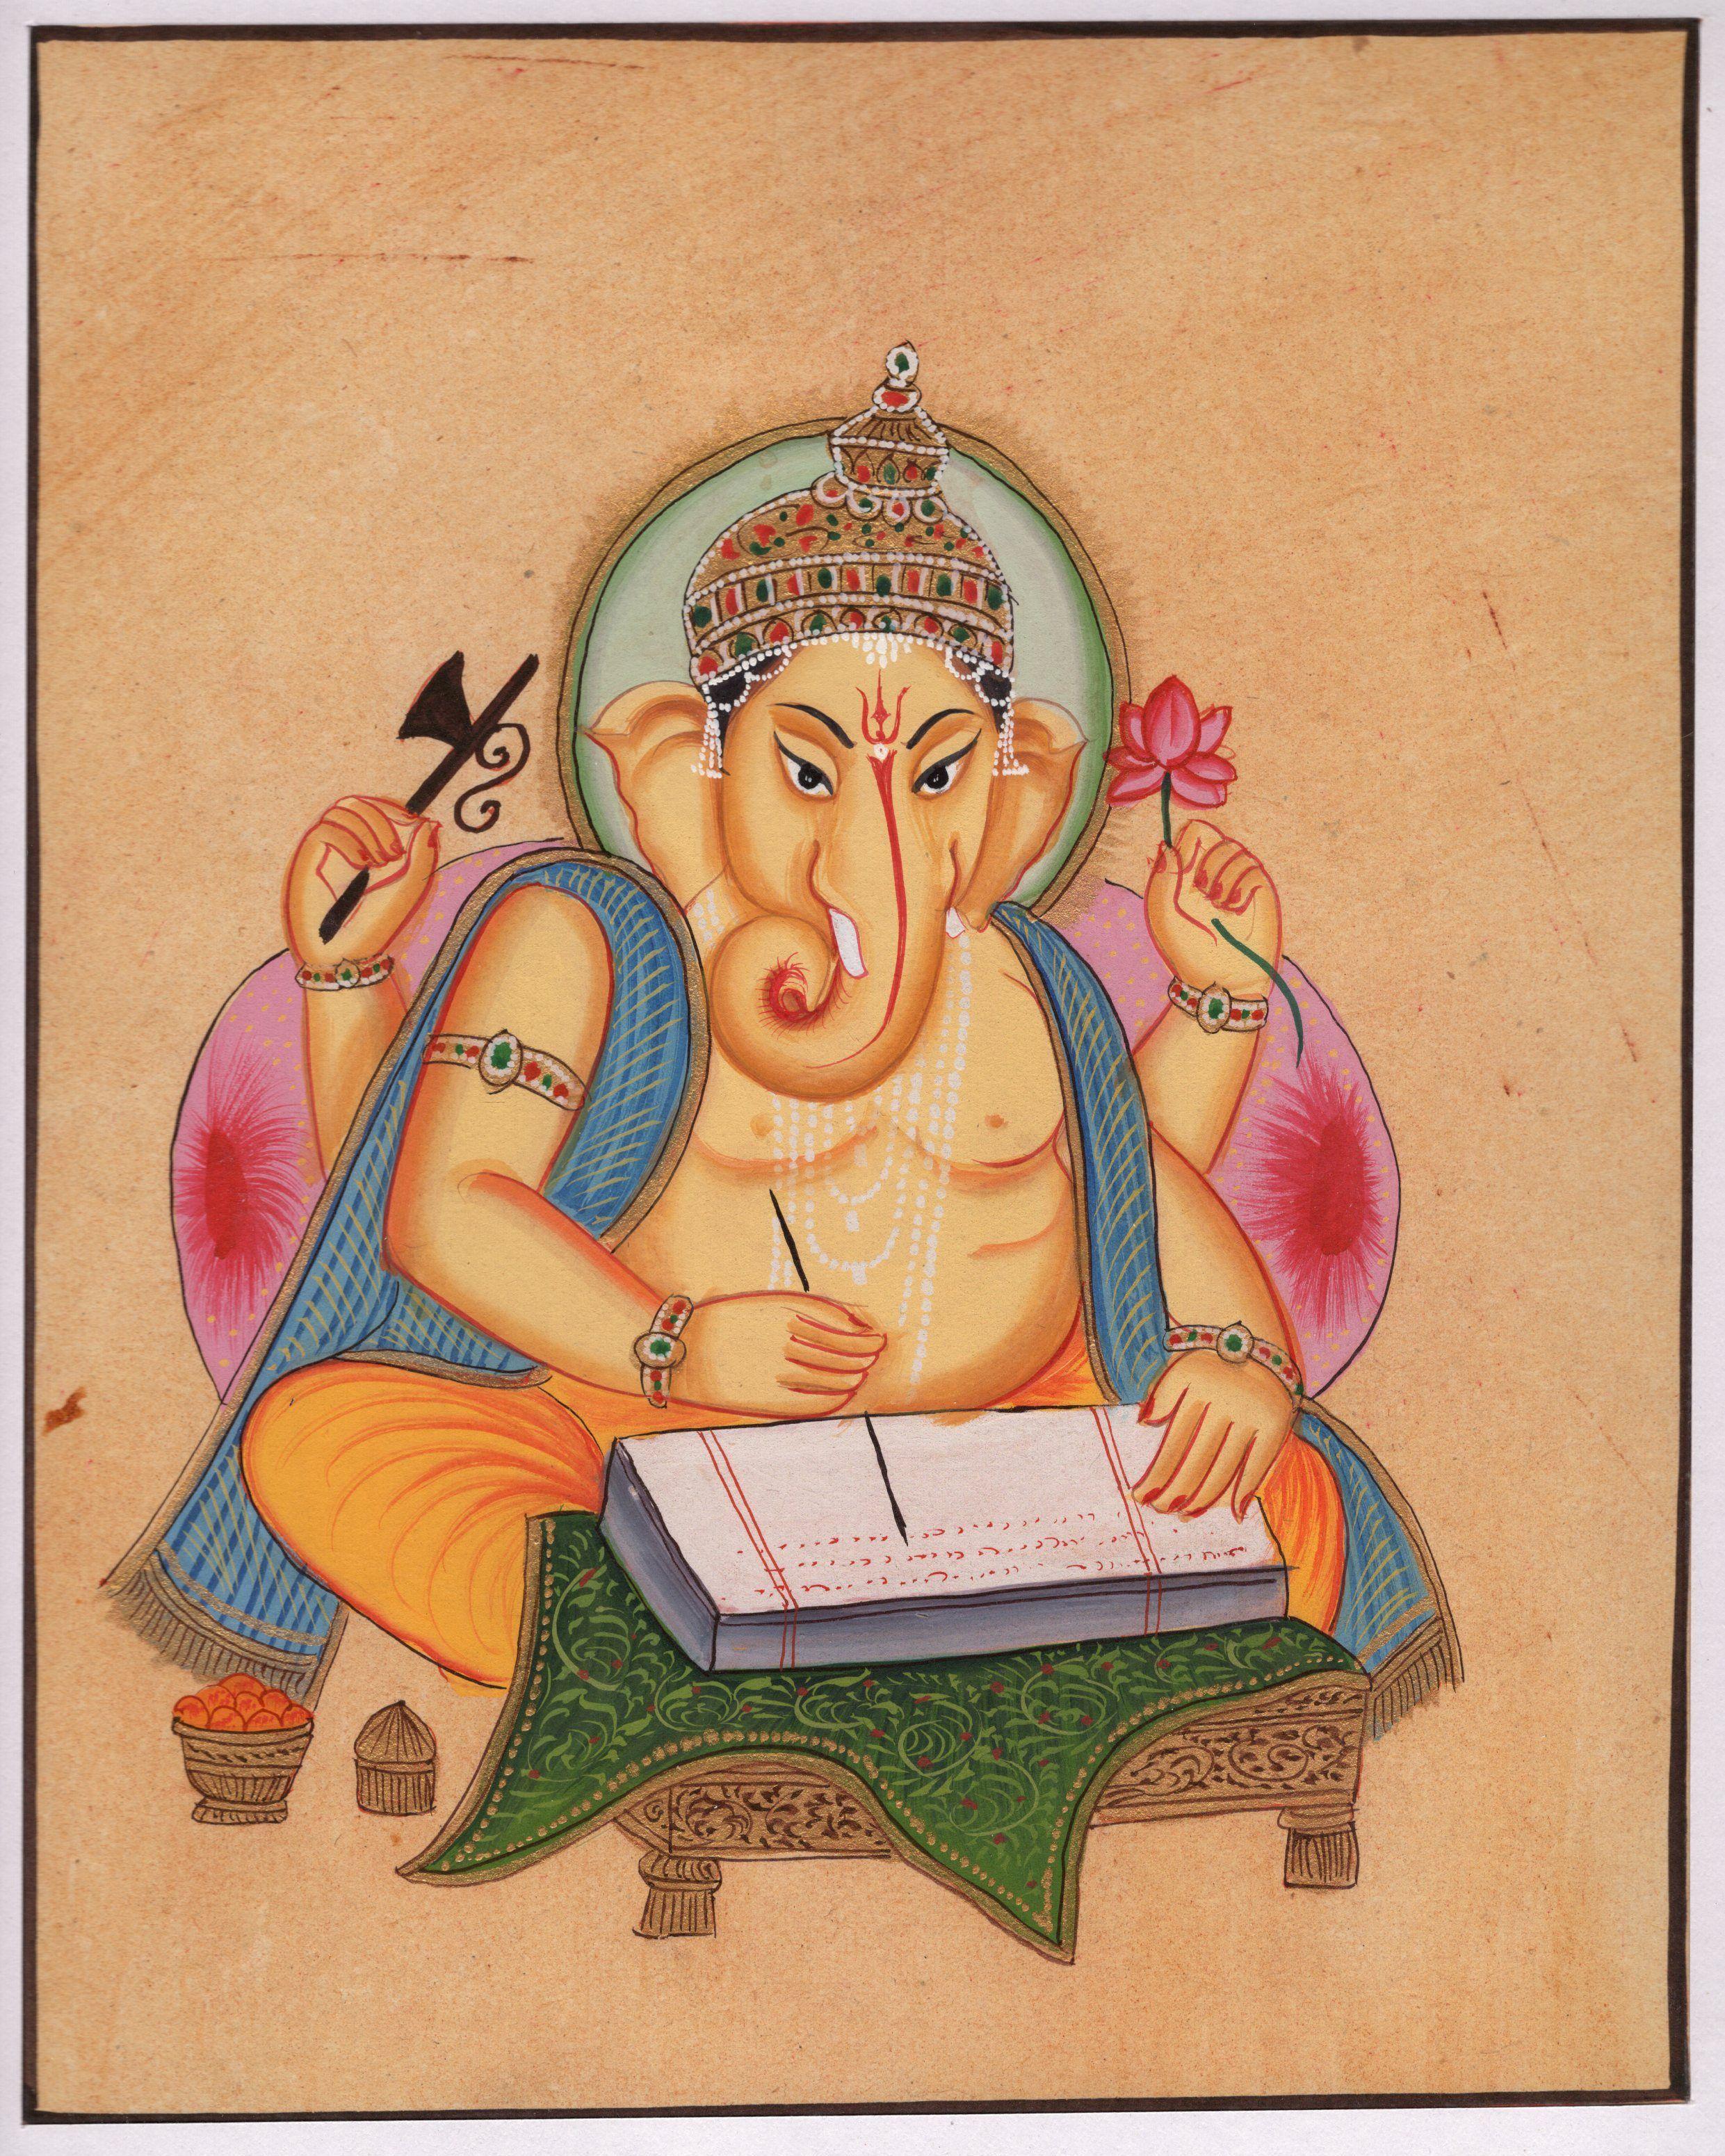 lord ganesha n miniature painting handmade ganesh hindu lord ganesha n miniature painting handmade ganesh hindu religion art